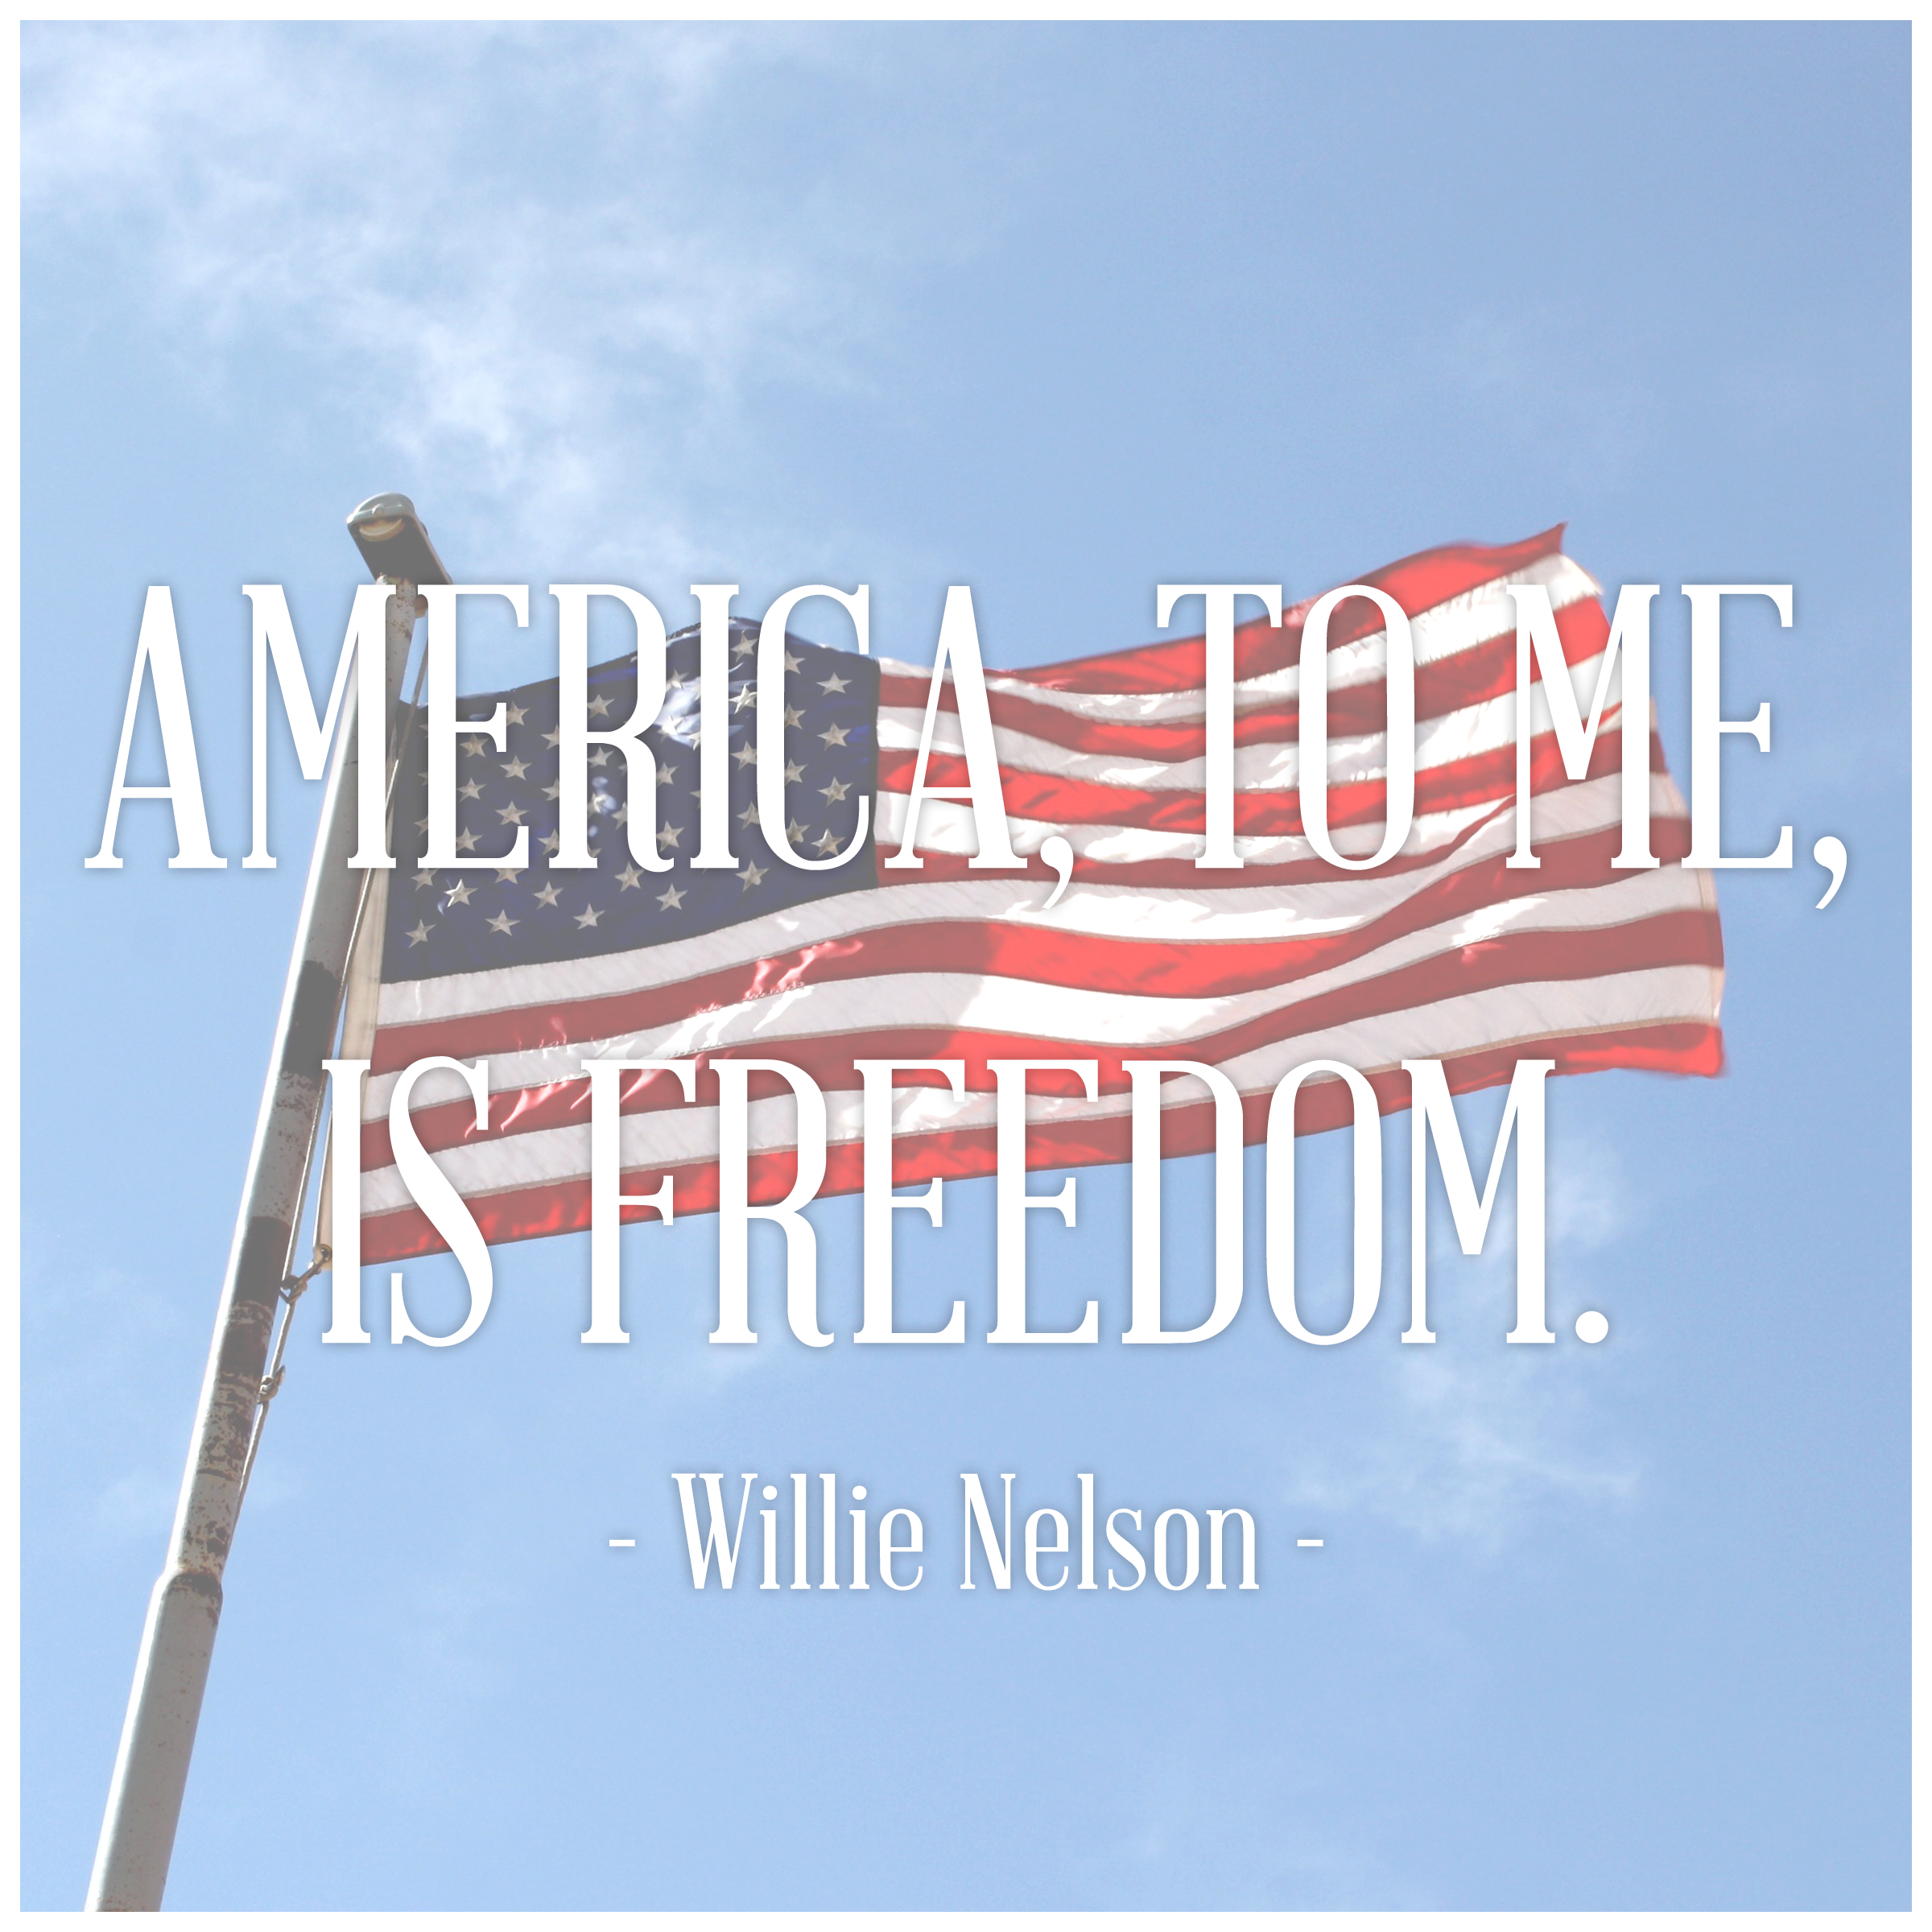 Patriotic Quotes: Patriotic Quotes /// Free Printables / Social Media Images